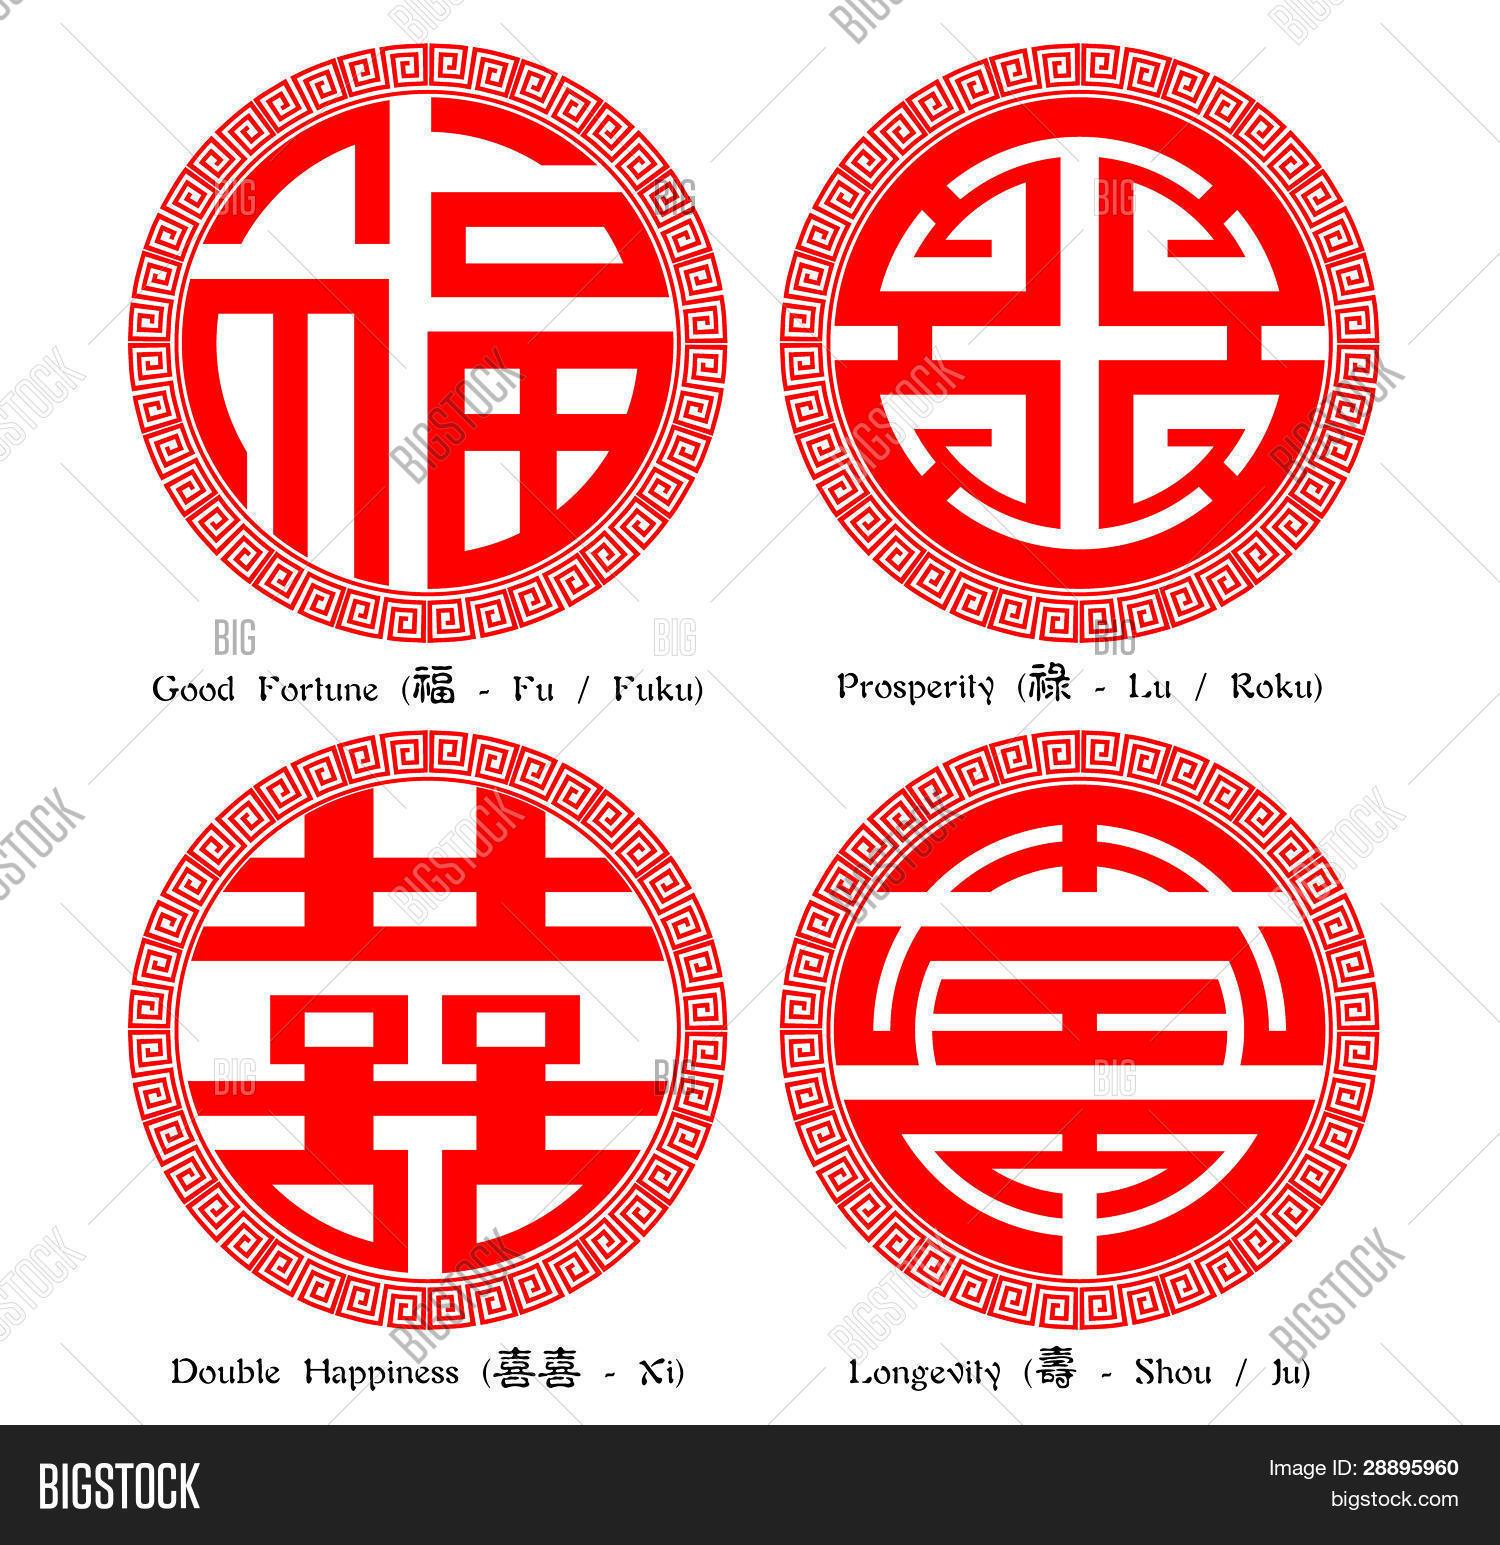 Chinese Symbols For Prosperity